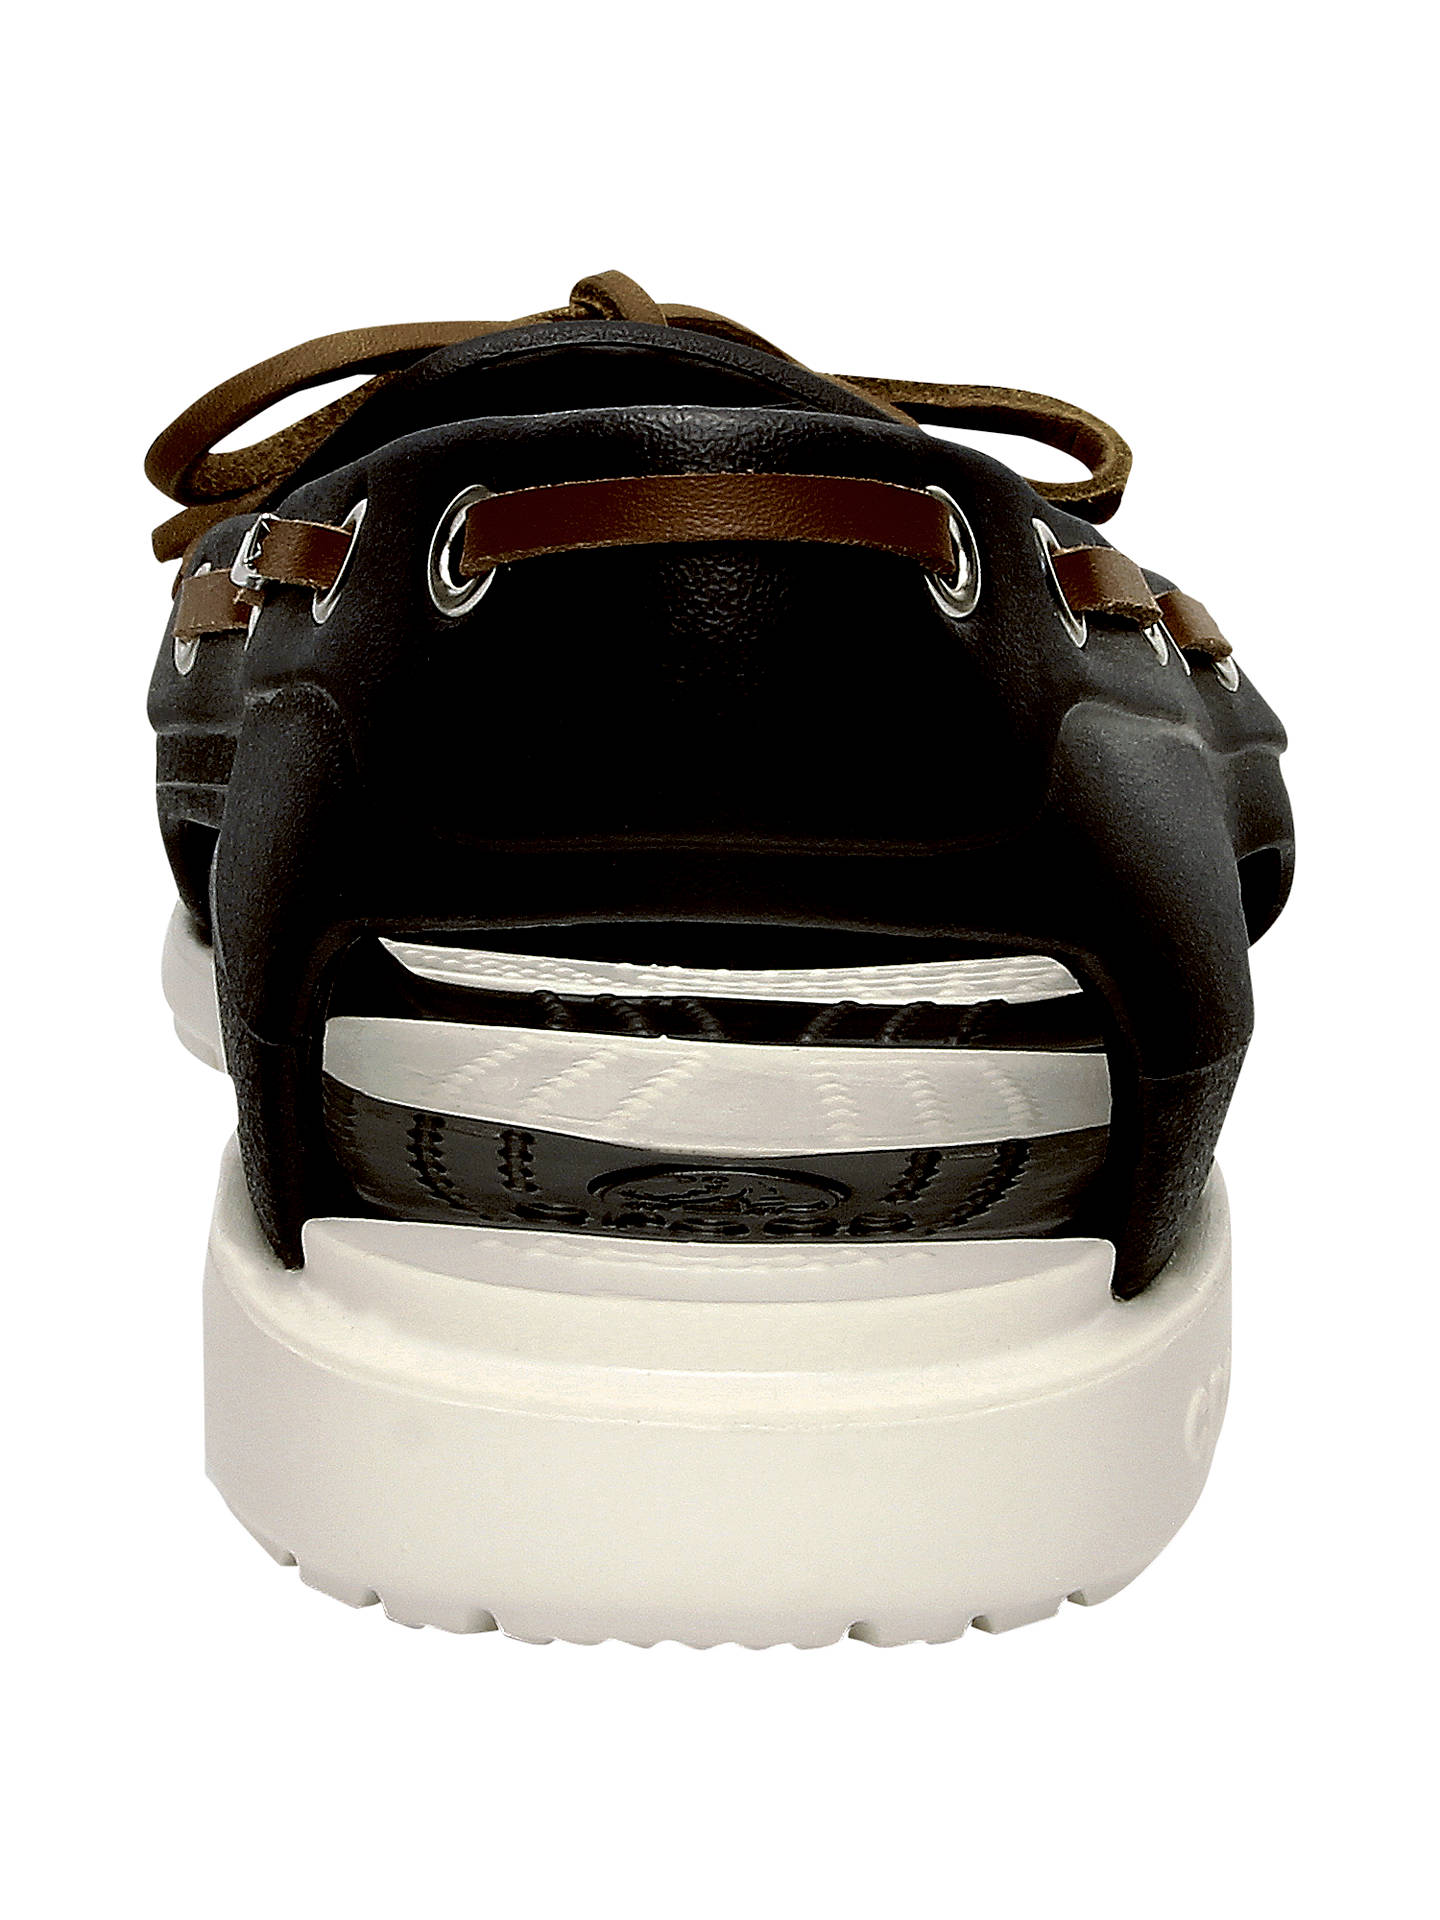 23a4040fa ... Buy Crocs Beach Line Women s Boat Shoes